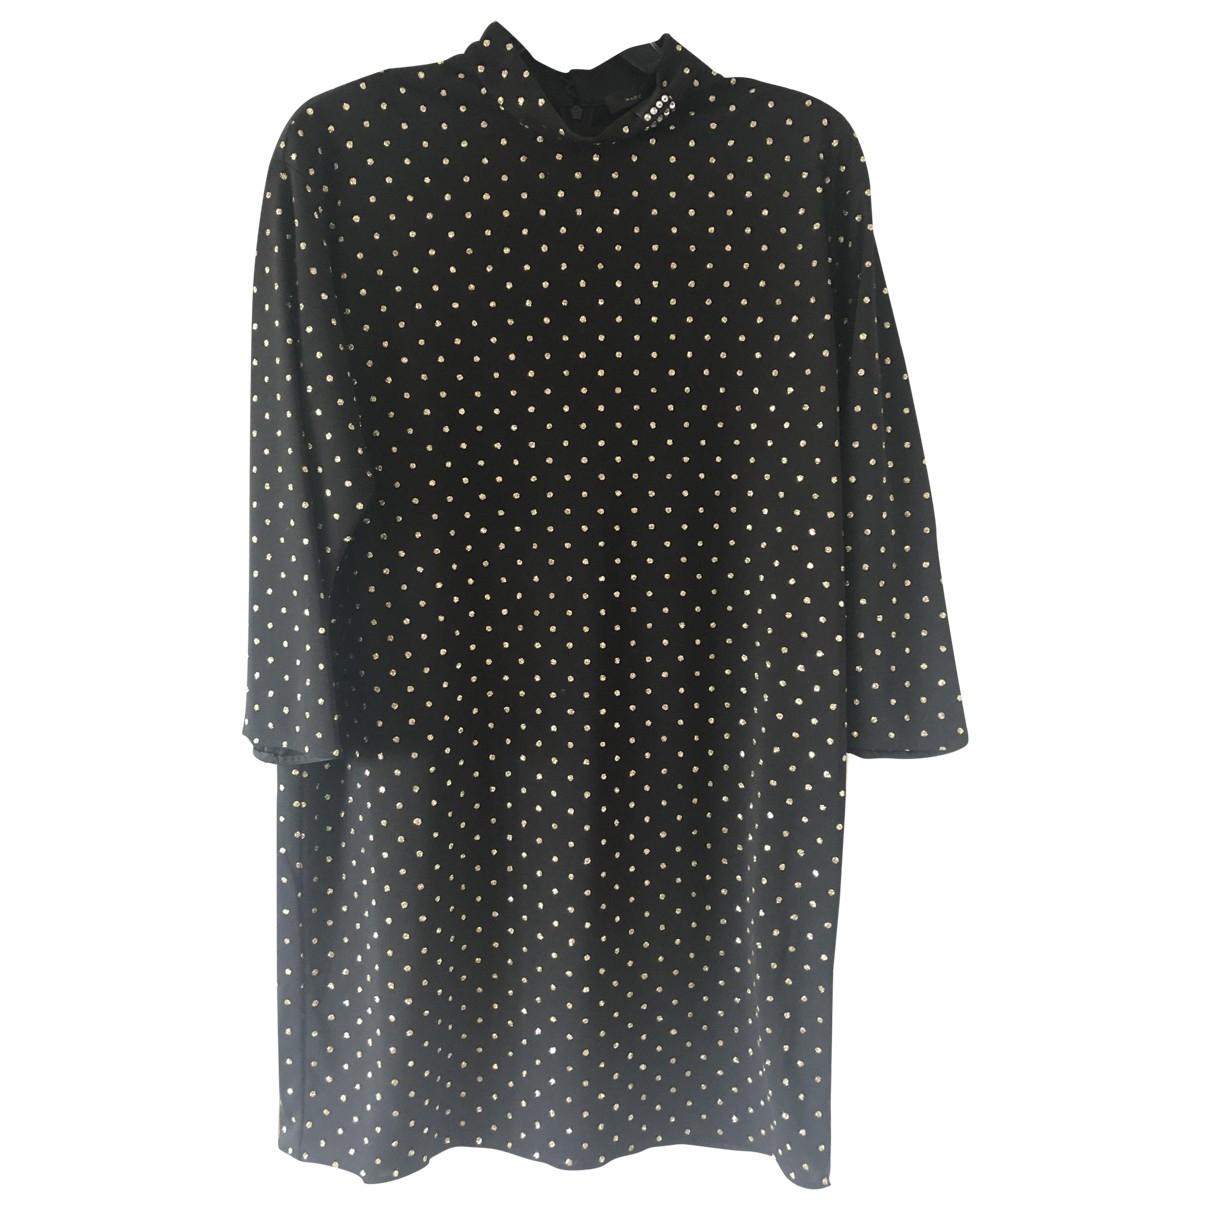 Marc Jacobs \N Black dress for Women 8 US